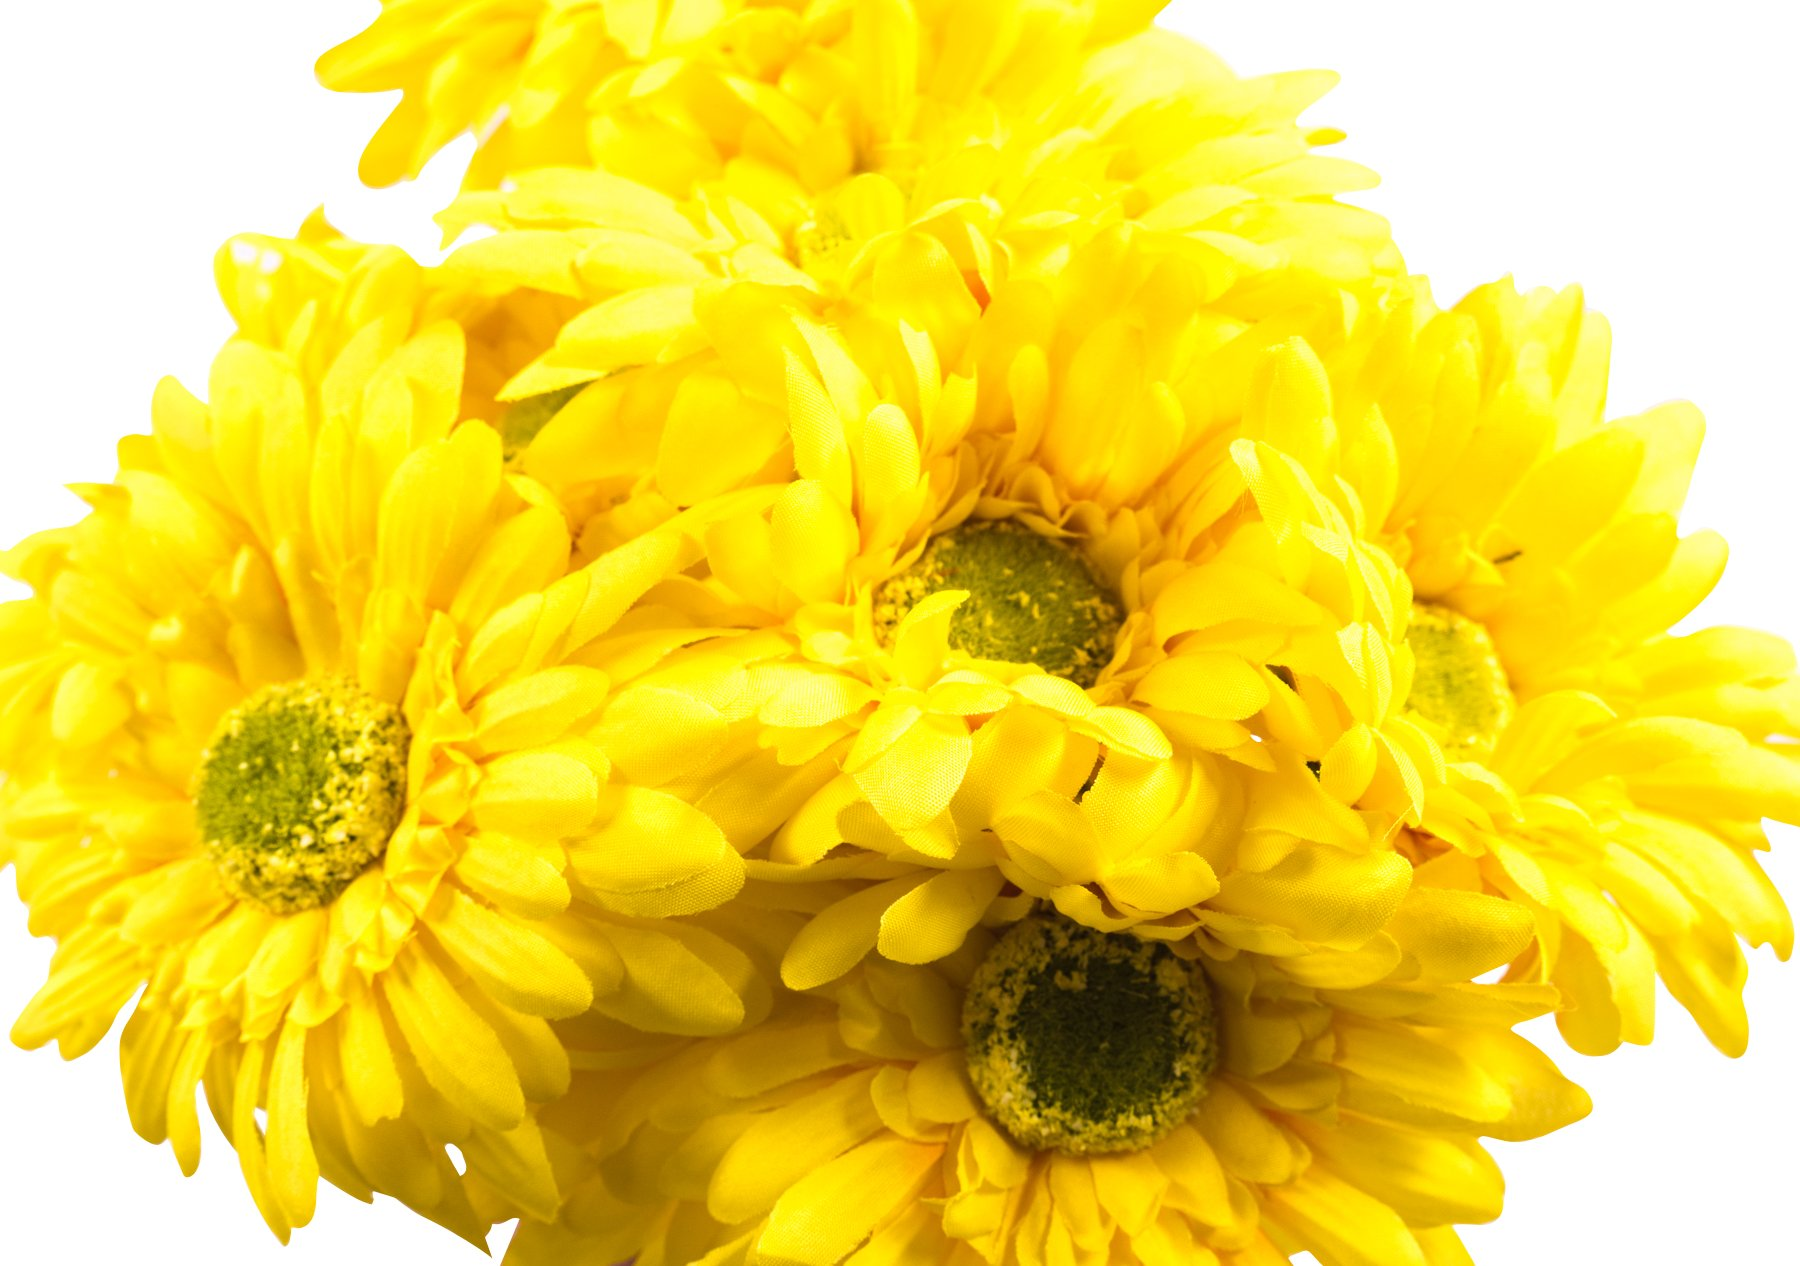 silk flower arrangements craftmore yellow colored gerbera daisy stems 14 inch set of 12